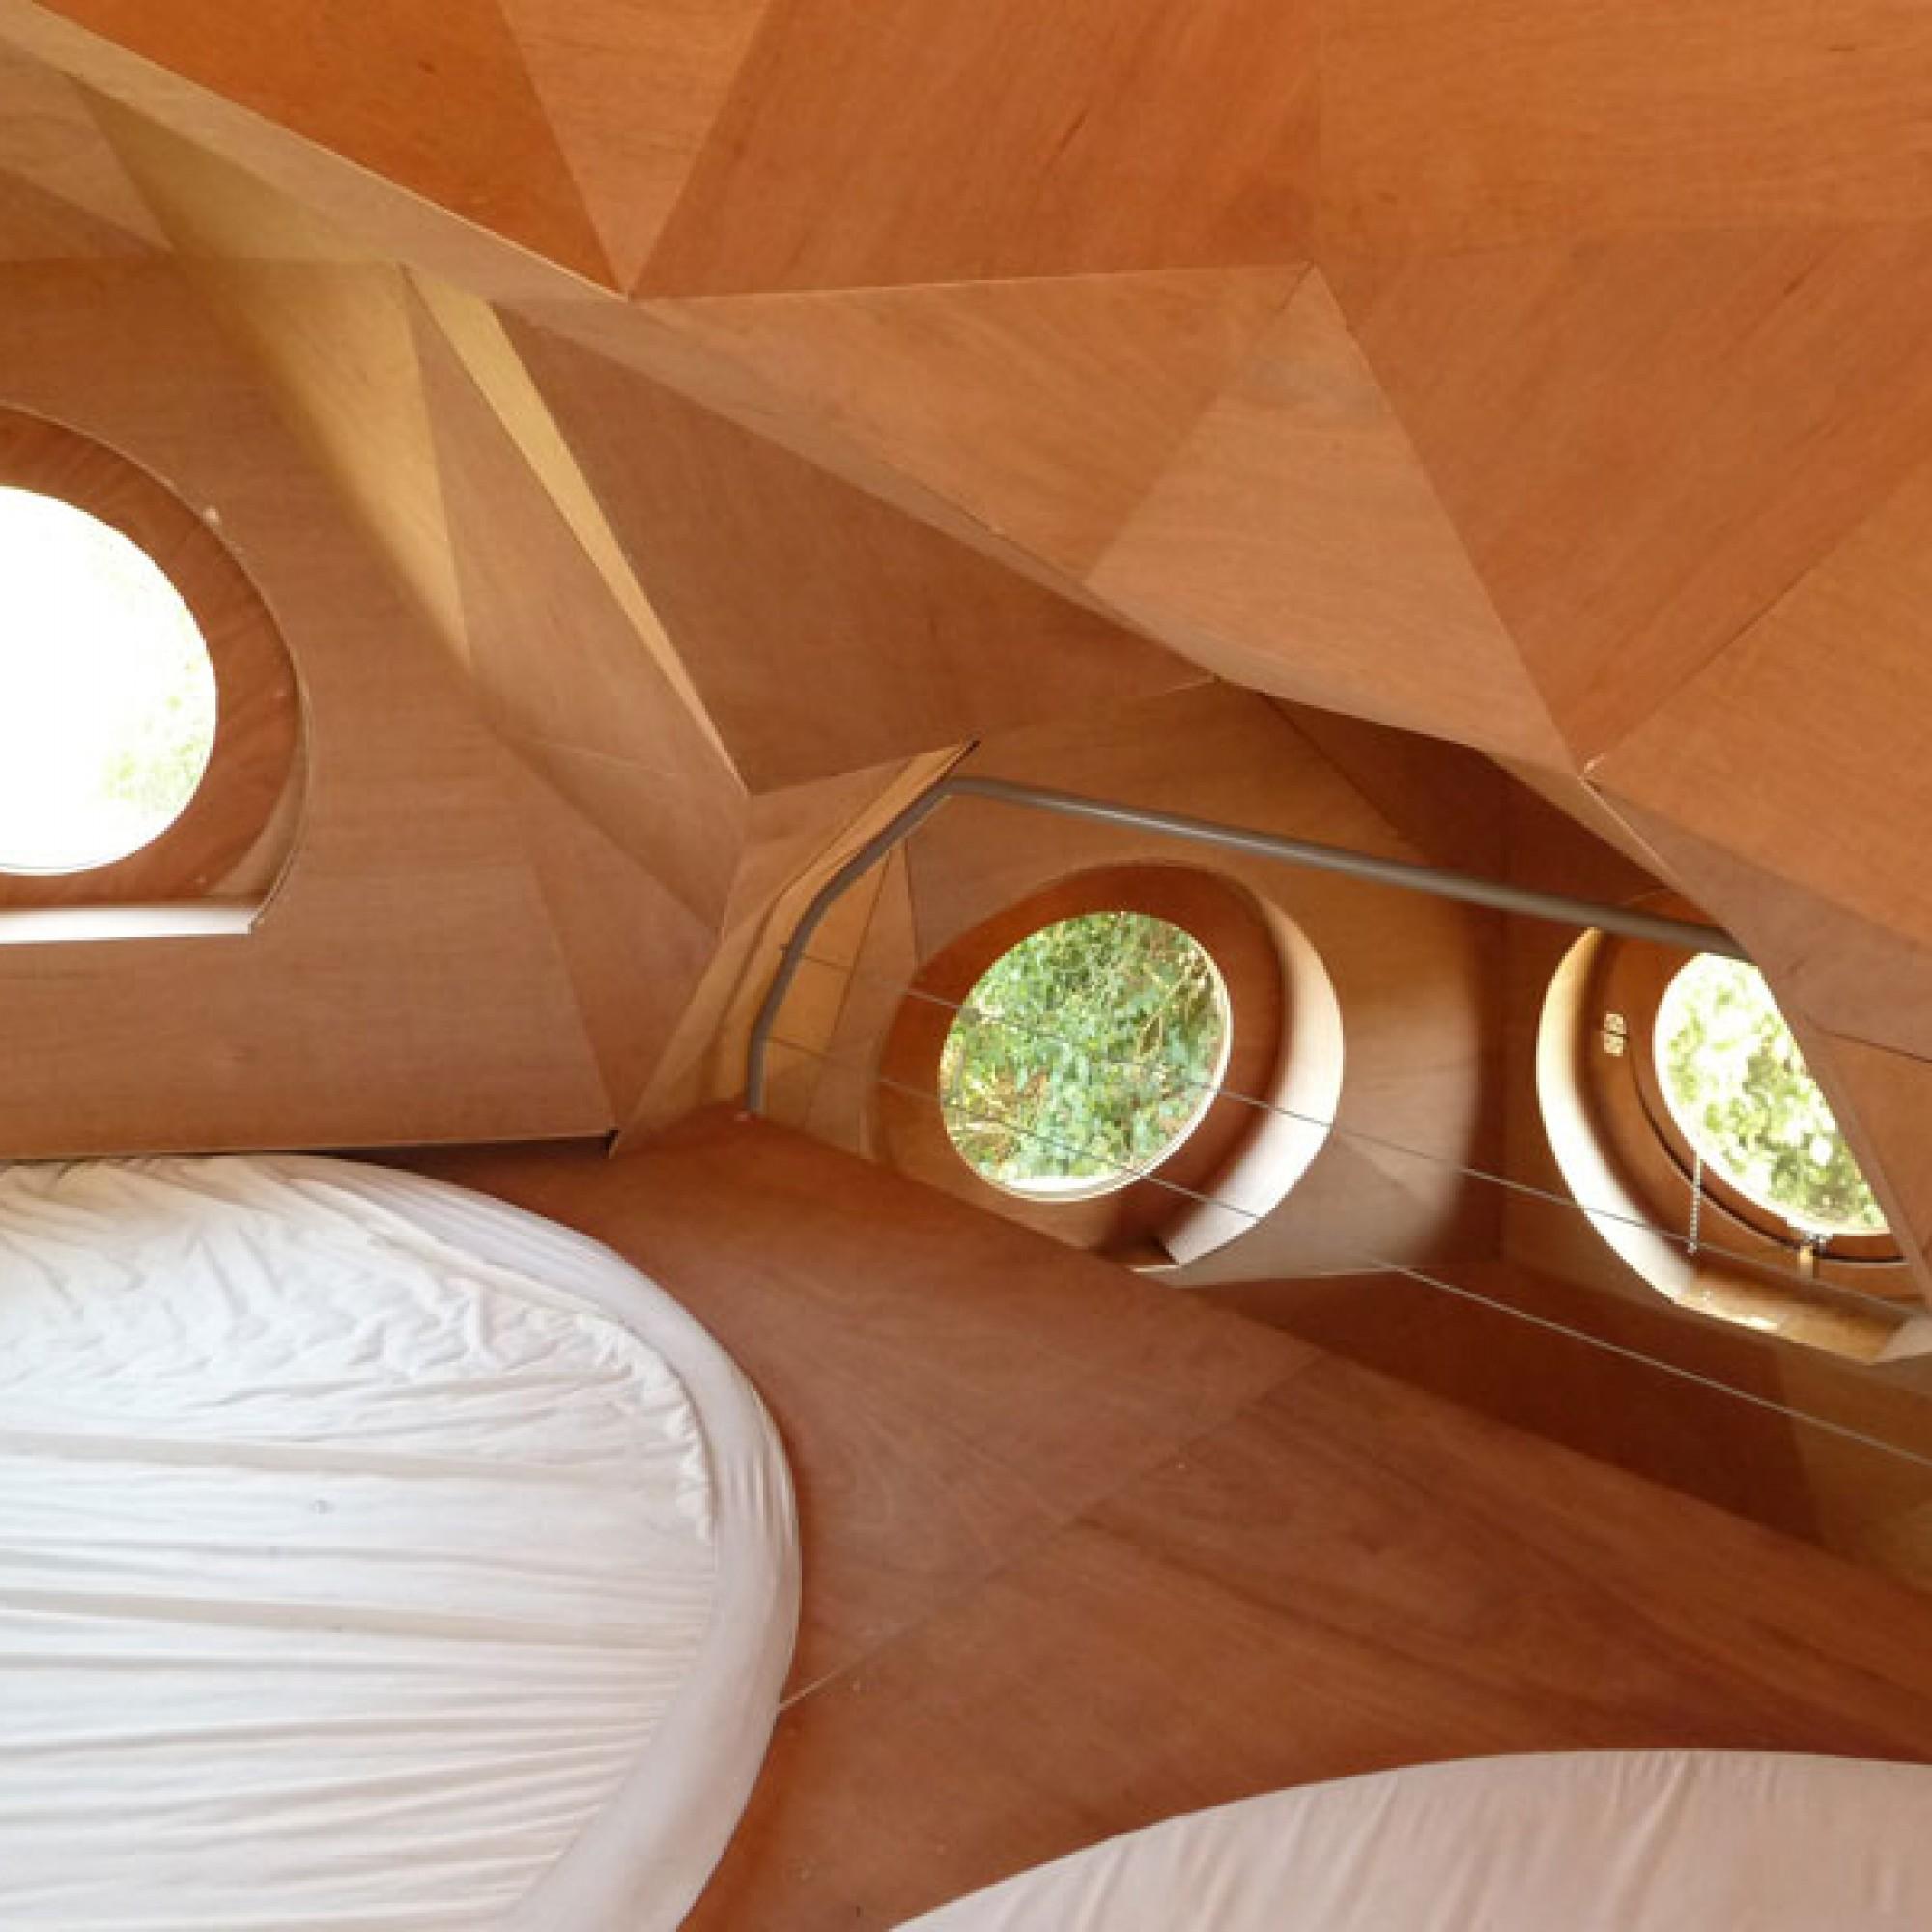 Das Innere der Konstruktion wirkt gemütlich. (Bild: Bordeaux Métropole/ Zebra3 CC BY-NC-ND 2.0)